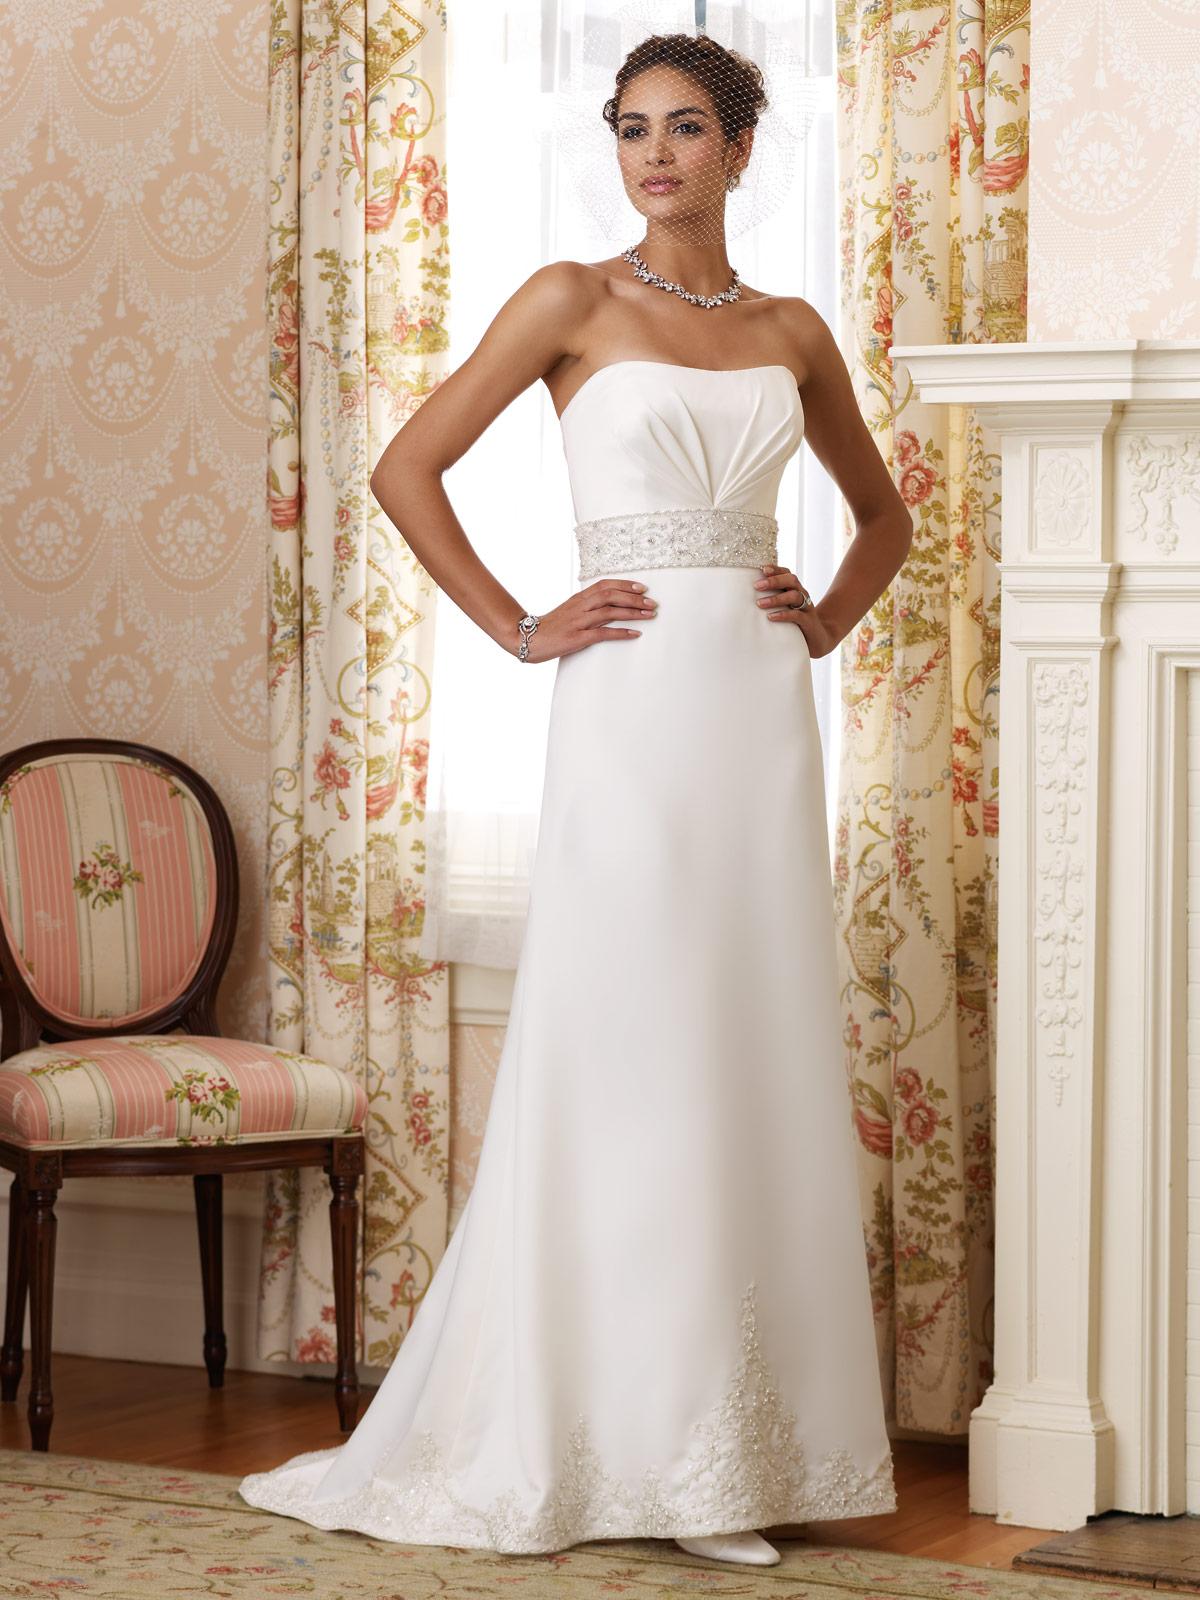 http://4.bp.blogspot.com/-68mgt6kAuWk/TjLGQ5POF_I/AAAAAAAAI_0/nWnr-ooY388/s1600/CBAW.co.cc+-+Wedding+Dresses+%252810%2529.jpg